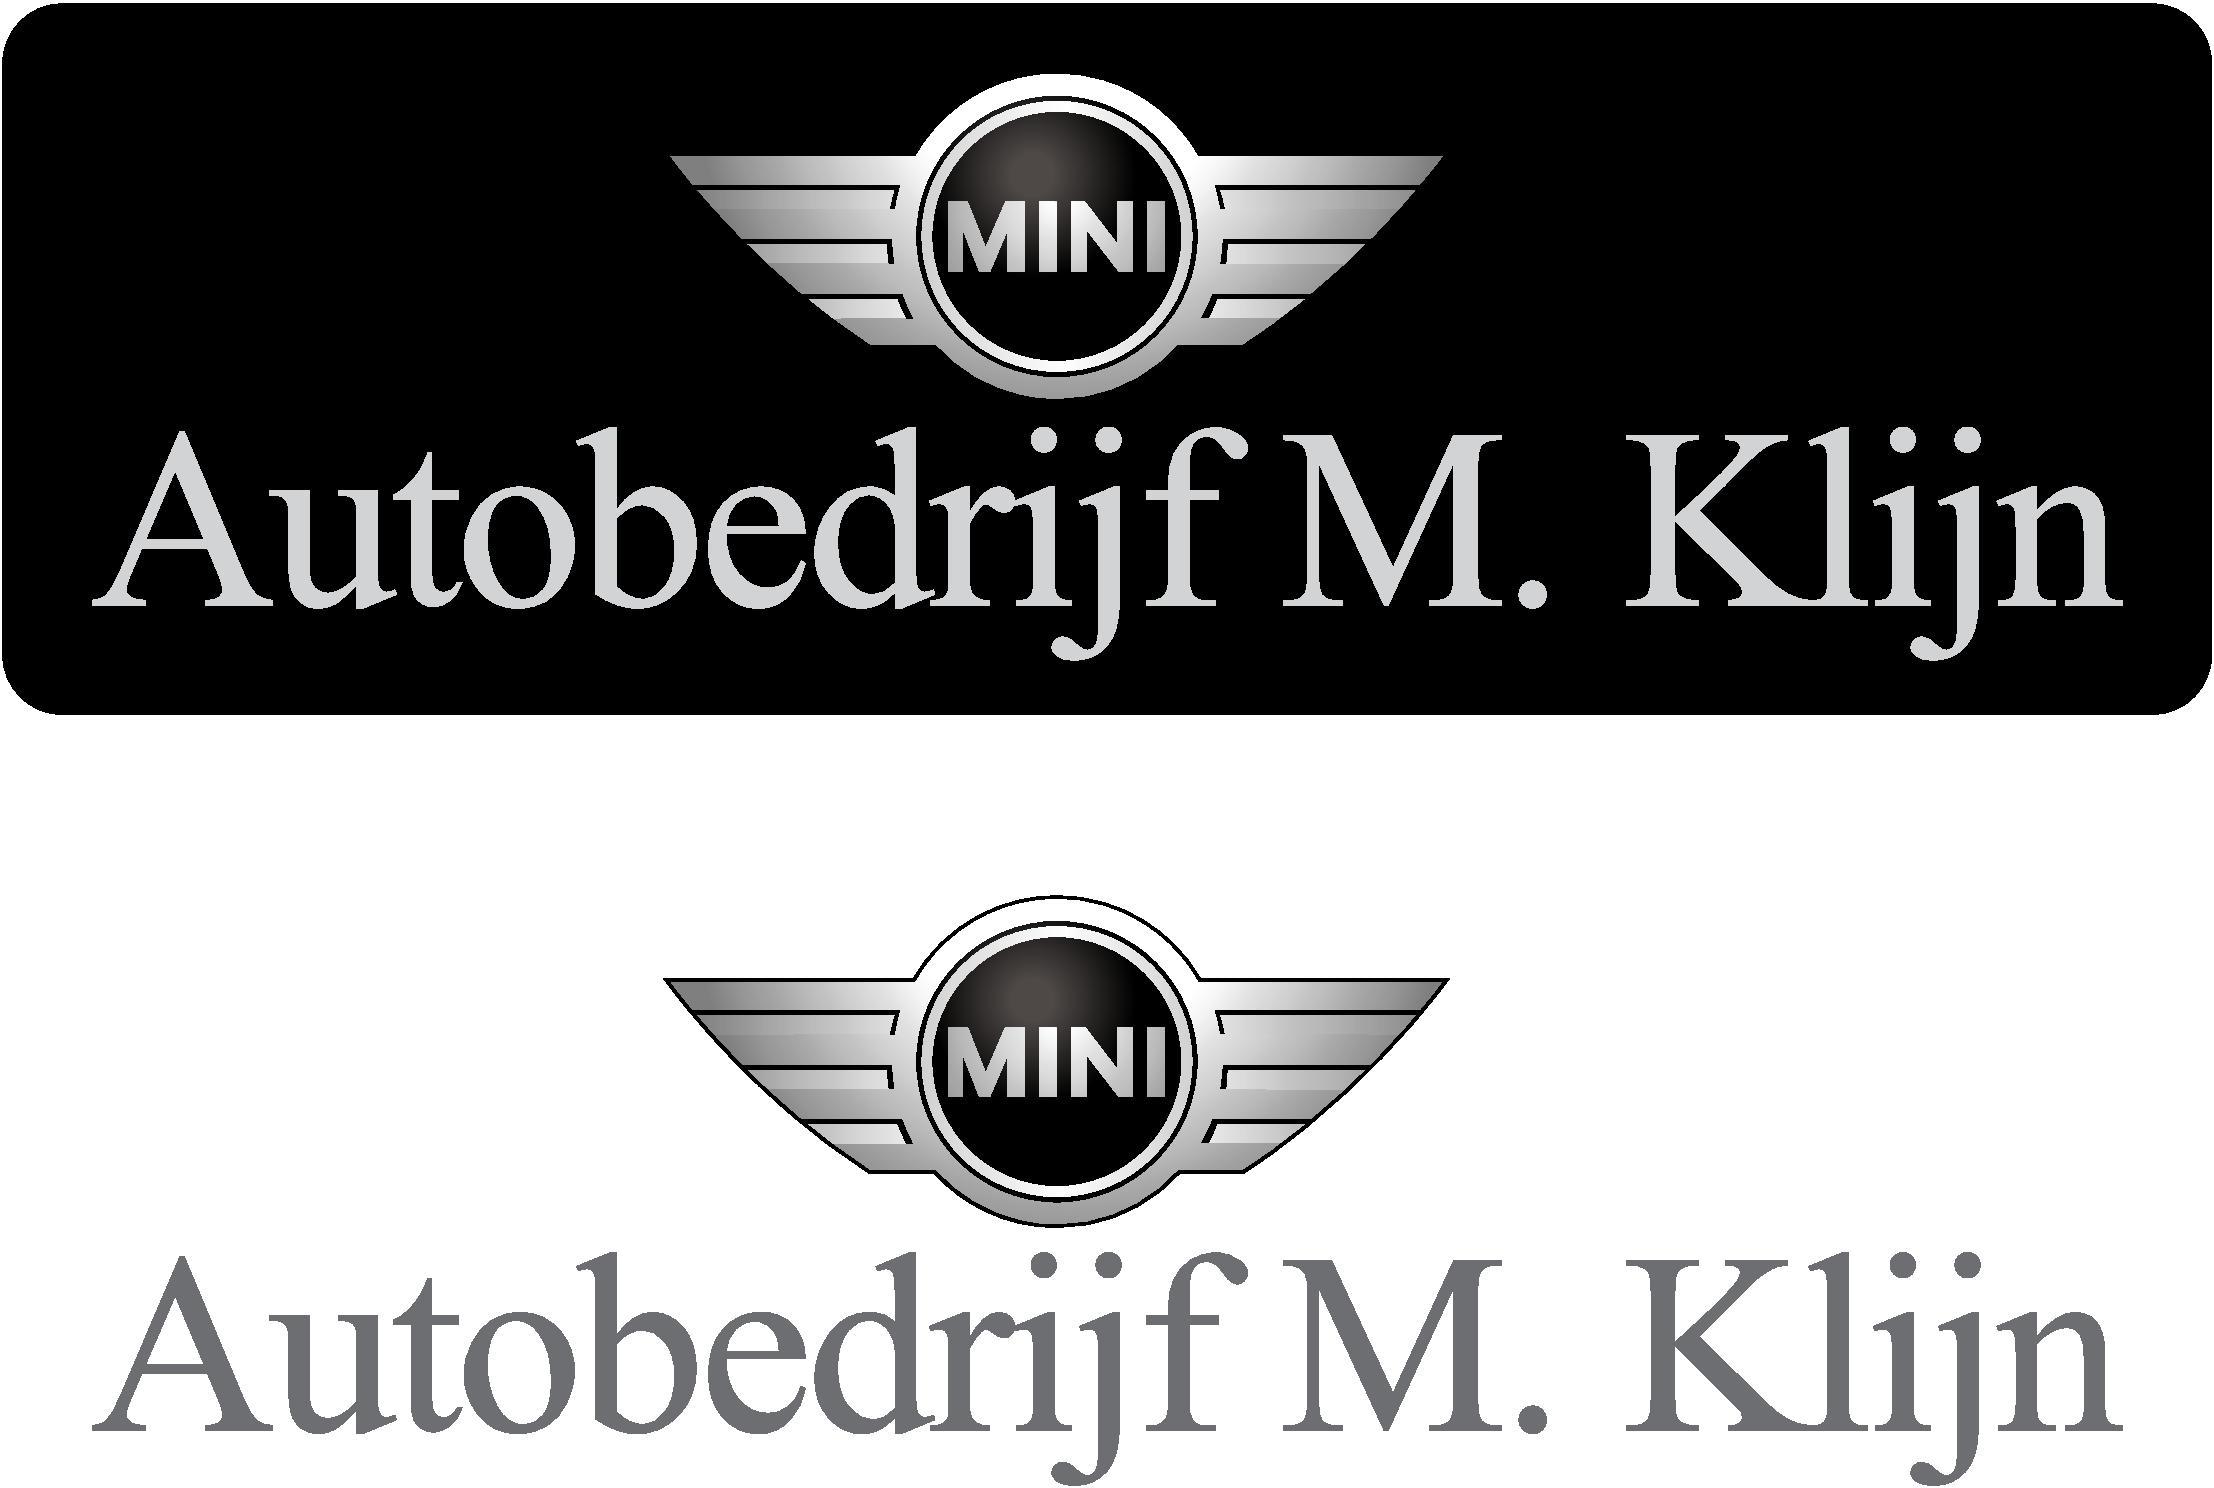 2017-logo-mini-klijn-page-001.jpg